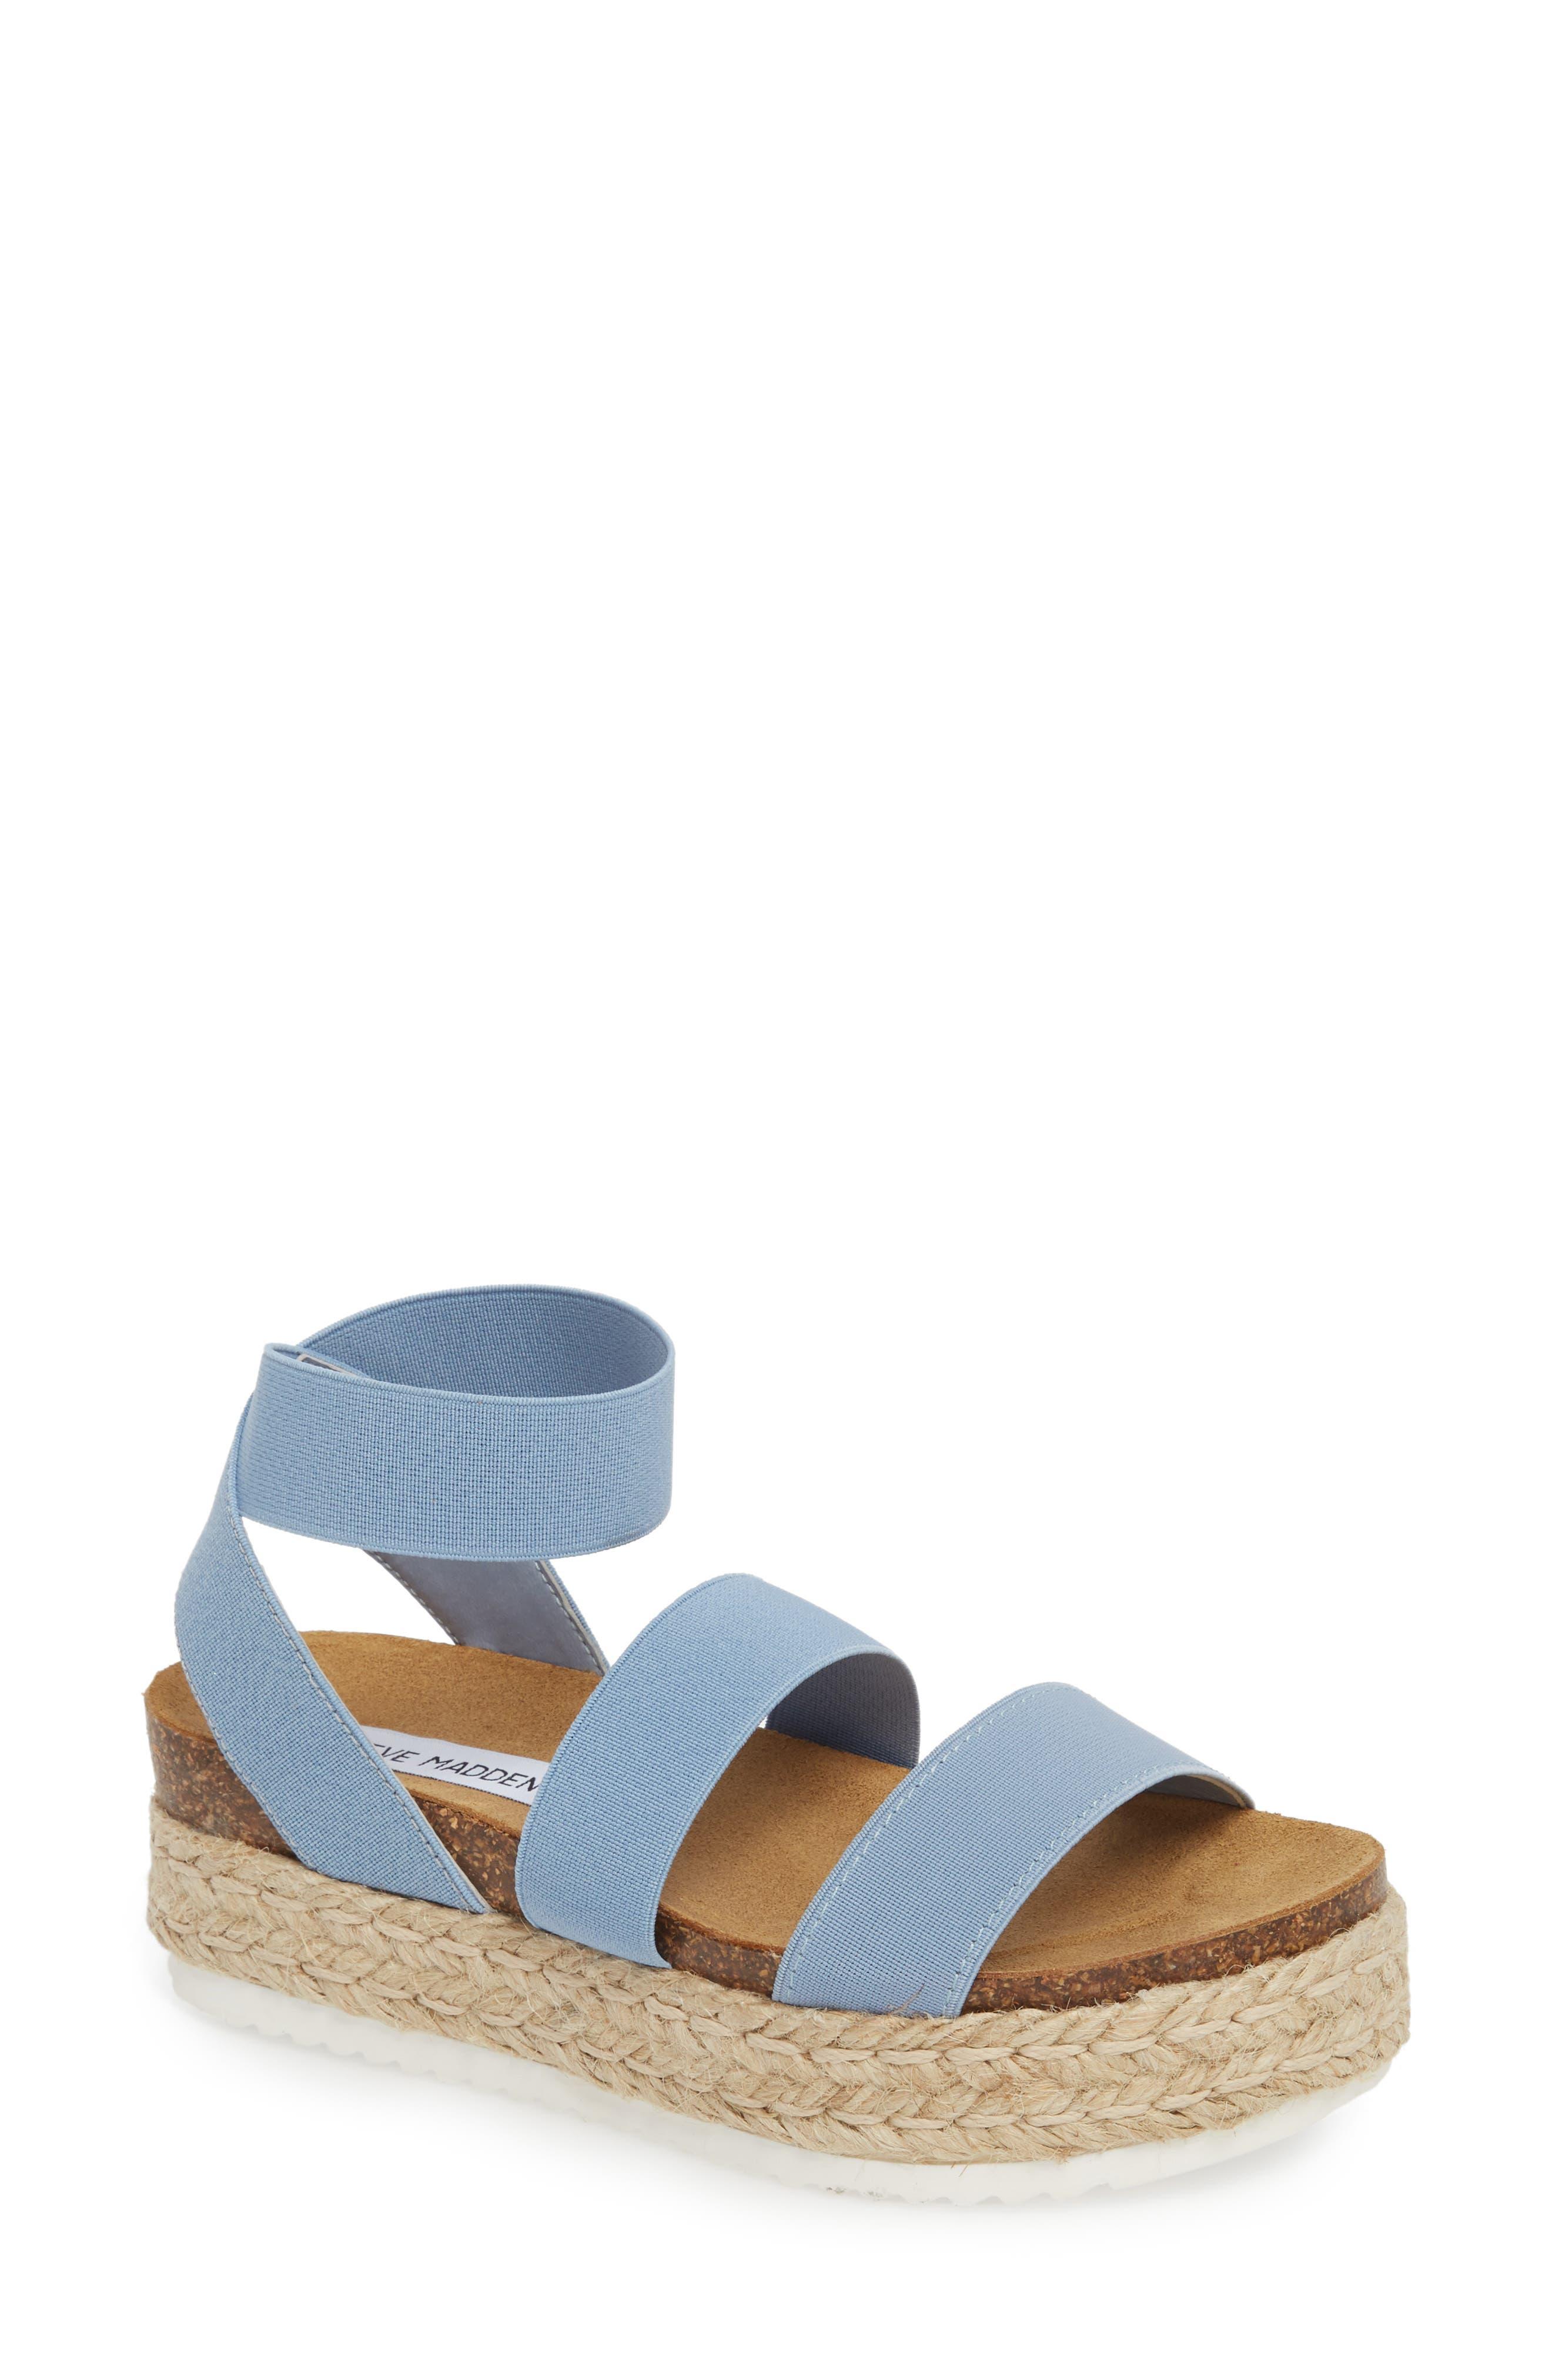 Kimmie Flatform Sandal,                             Main thumbnail 1, color,                             Blue